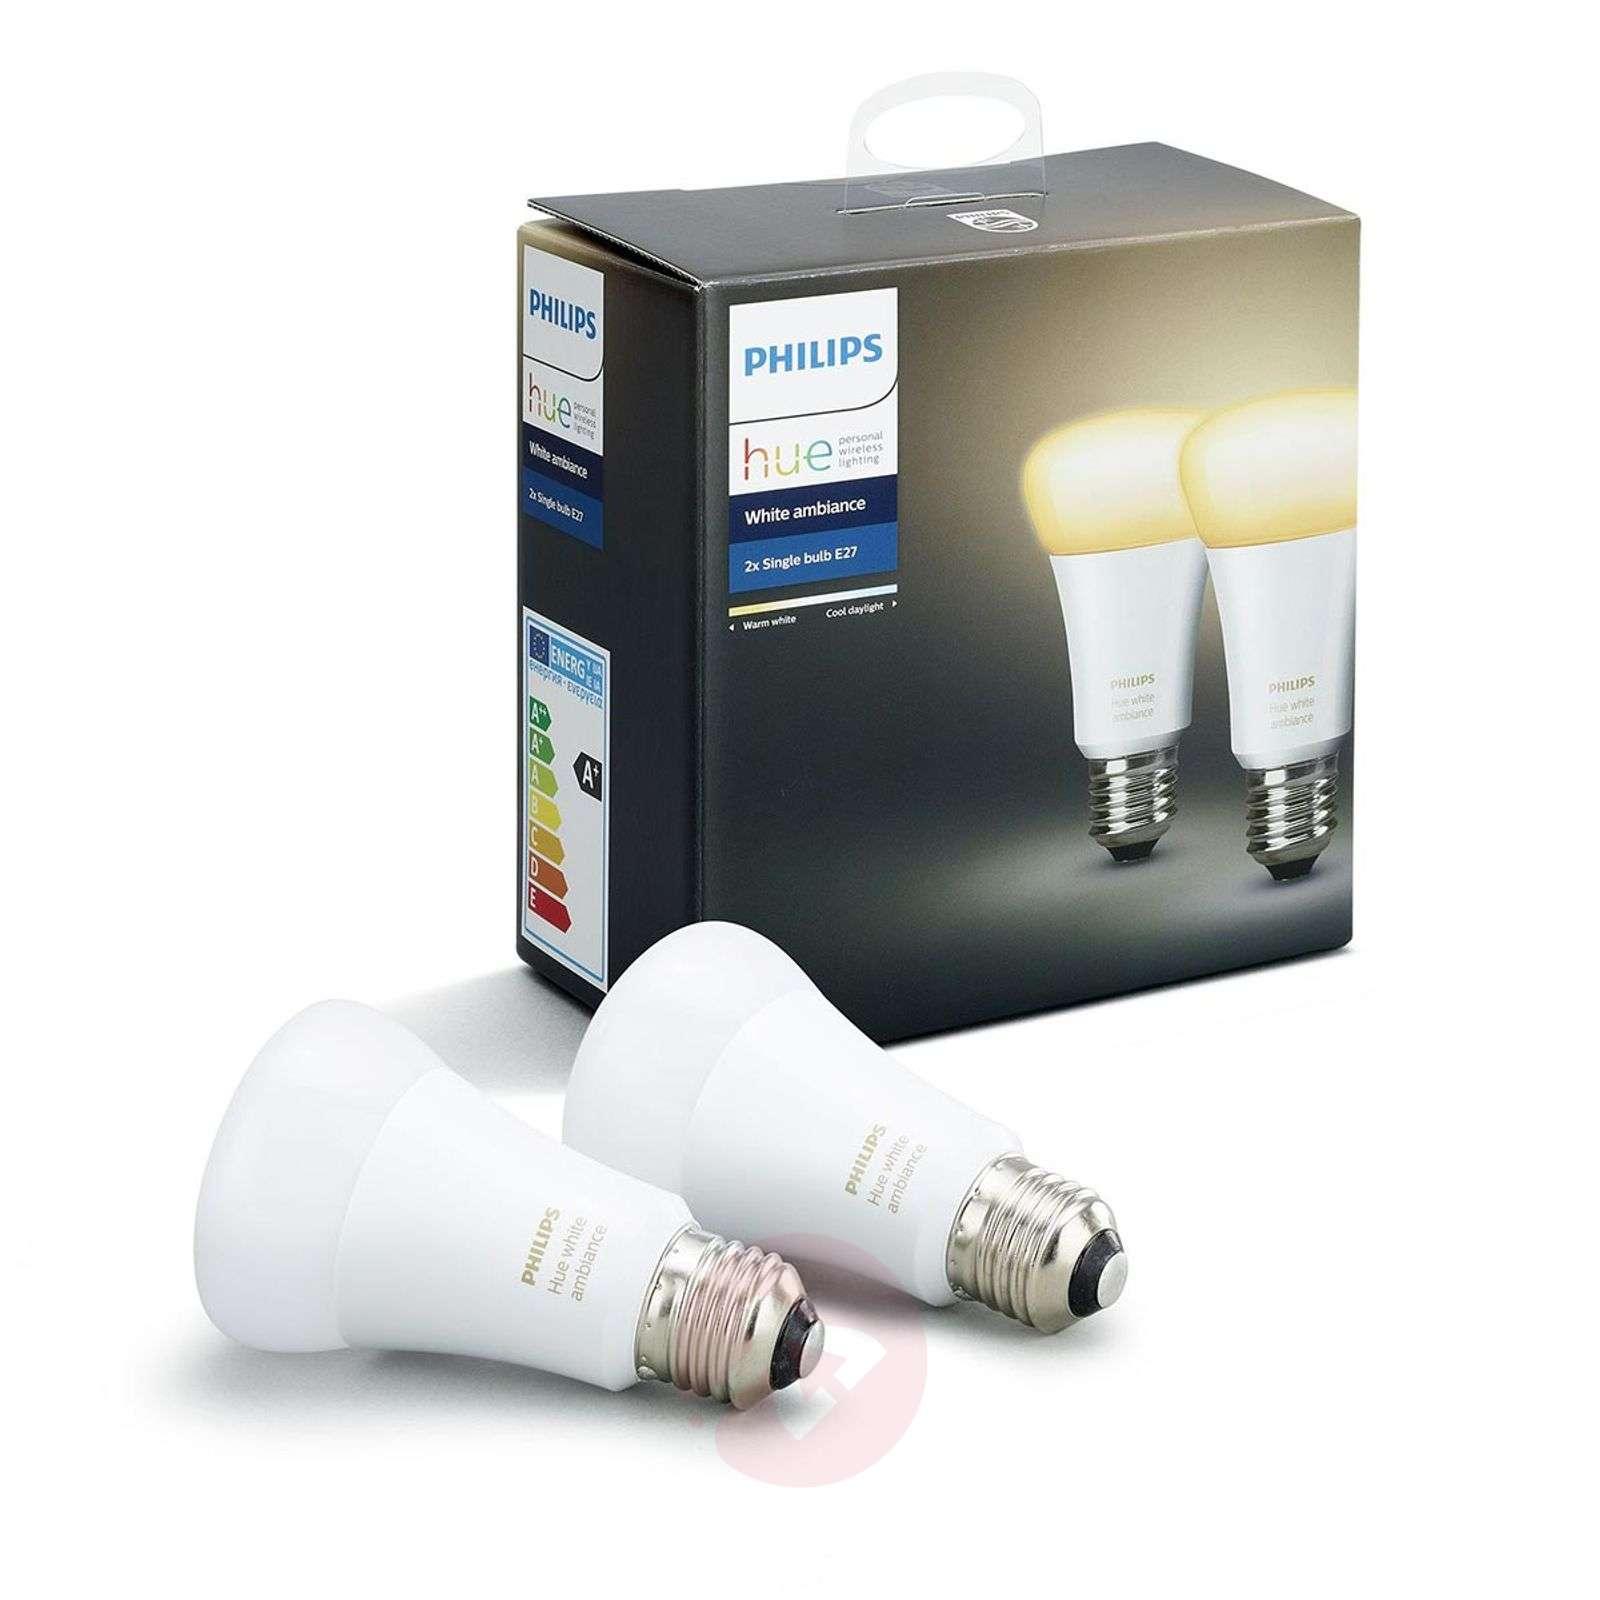 Philips Hue White Ambiance 2 x 9.5W E27-7532036-01